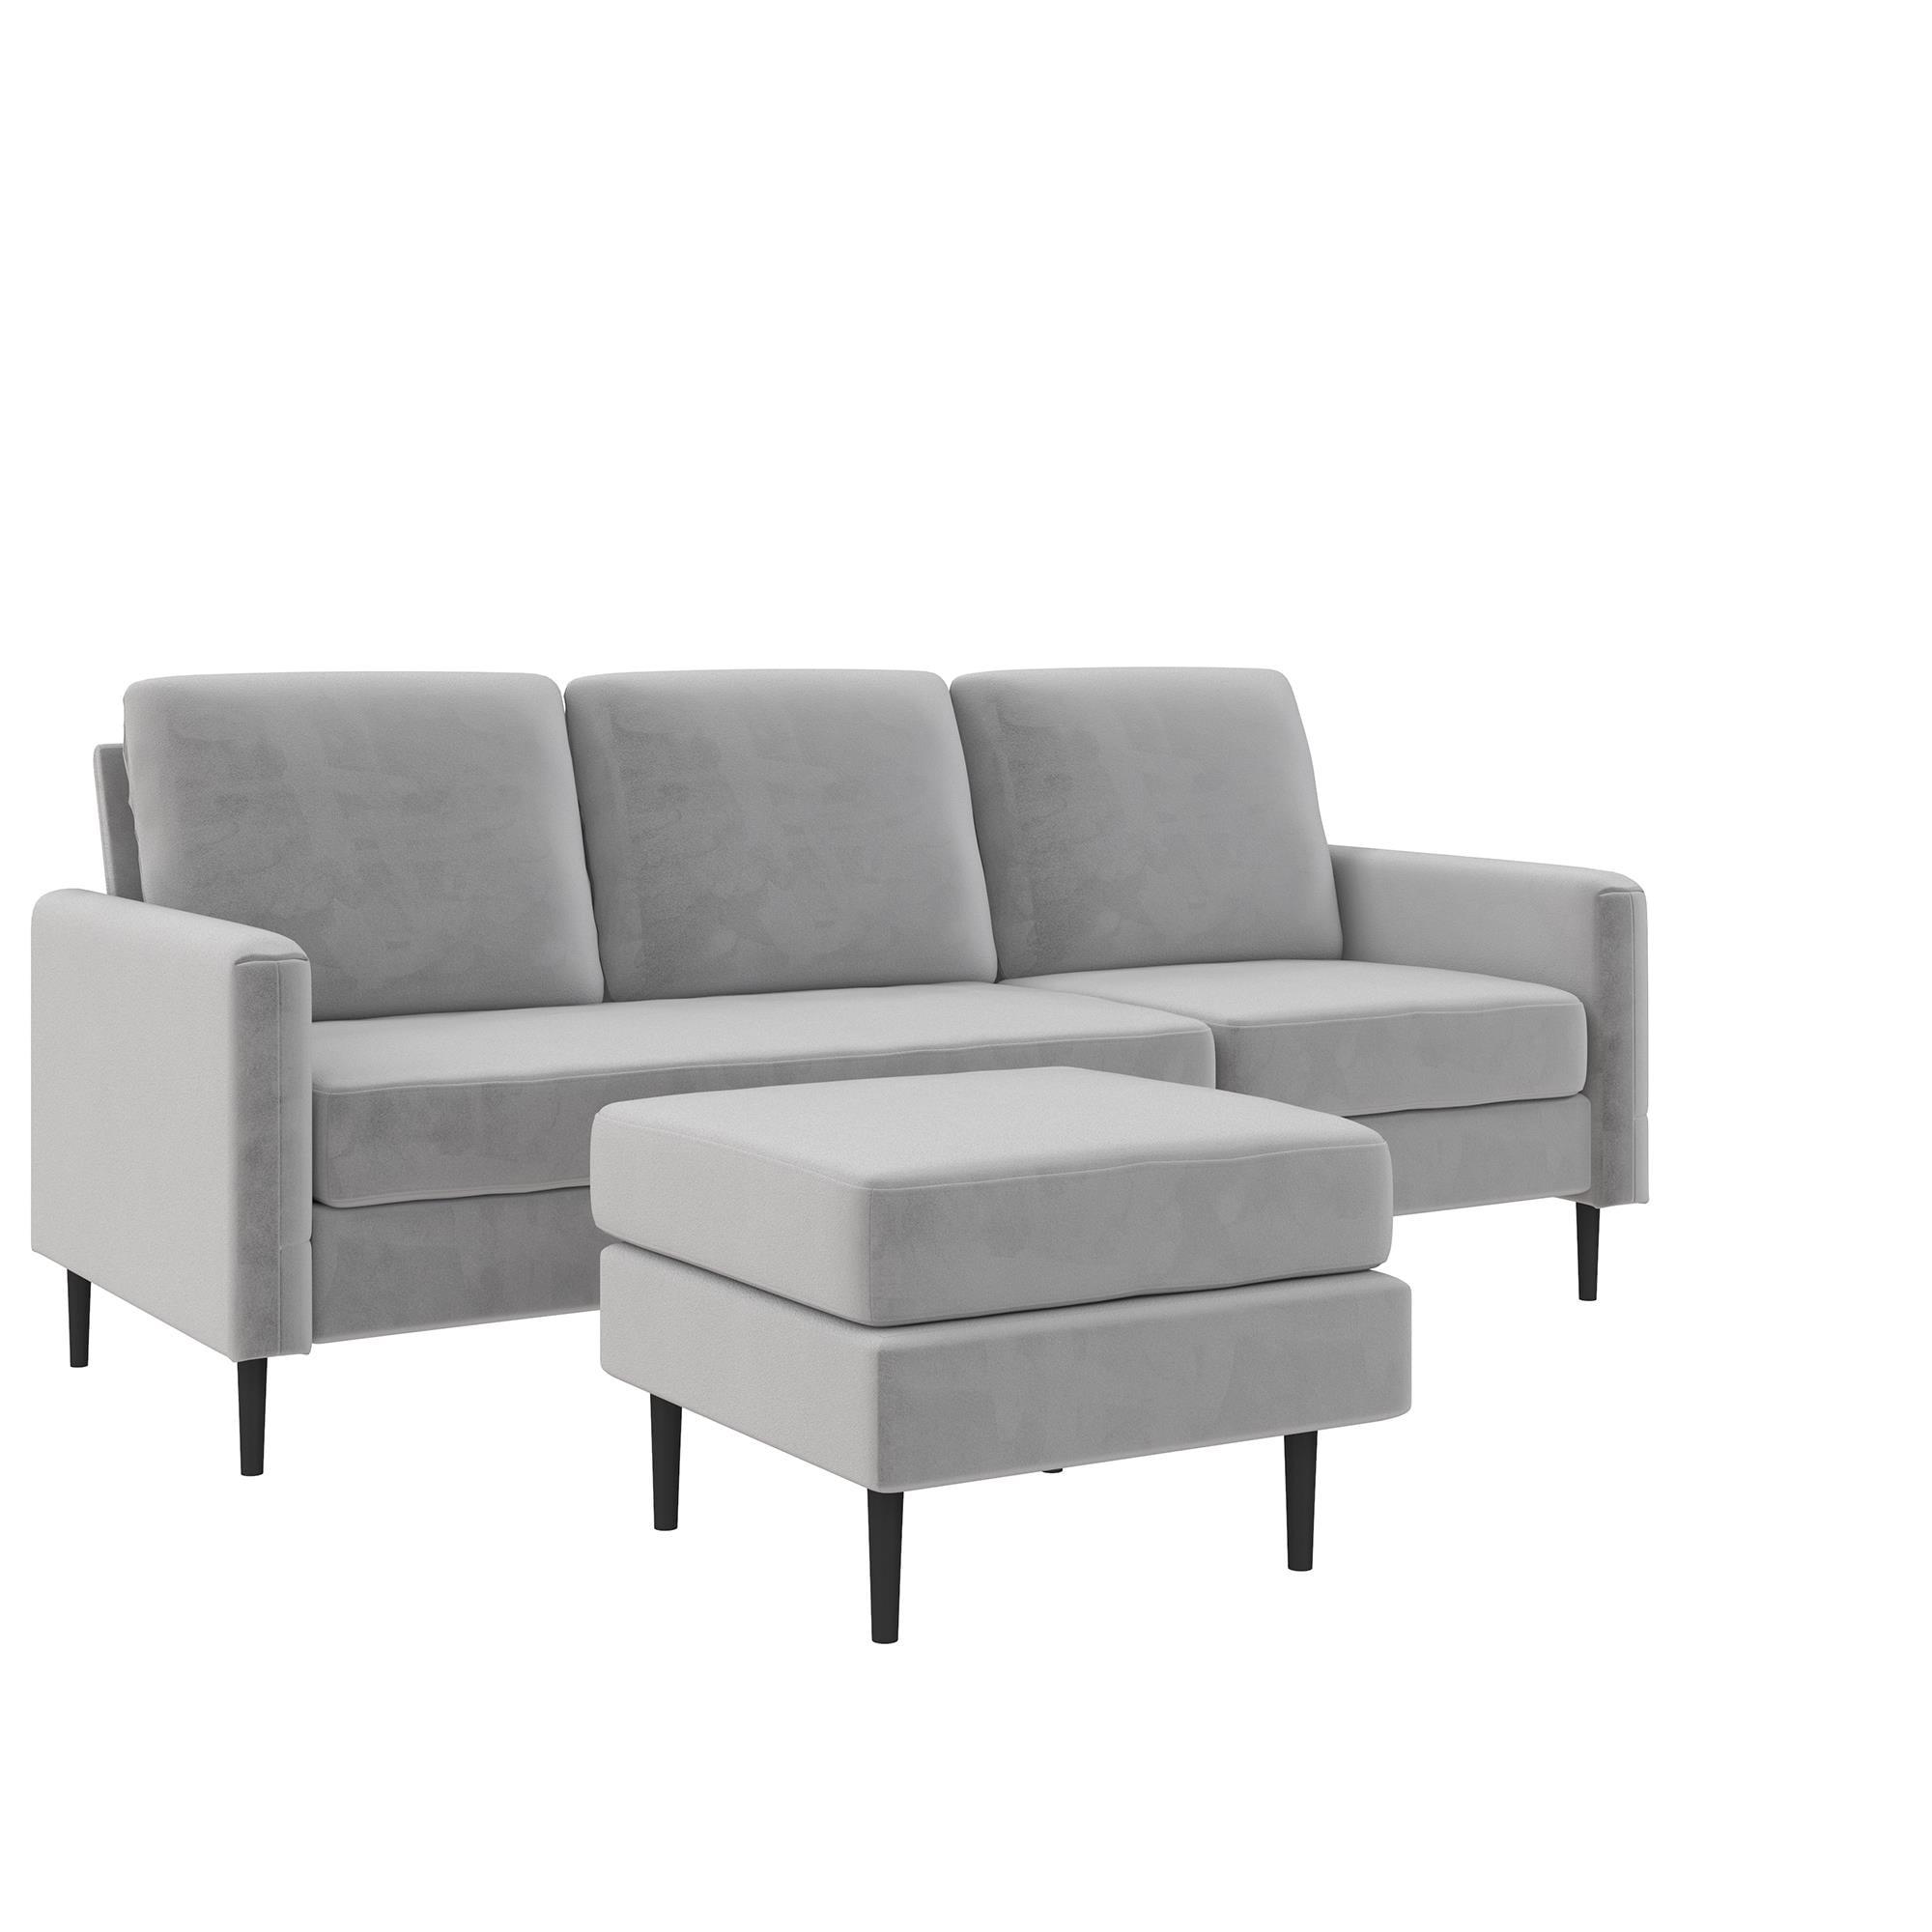 Avenue Greene Medyna Pillowback Sofa Sectional -  DO34988